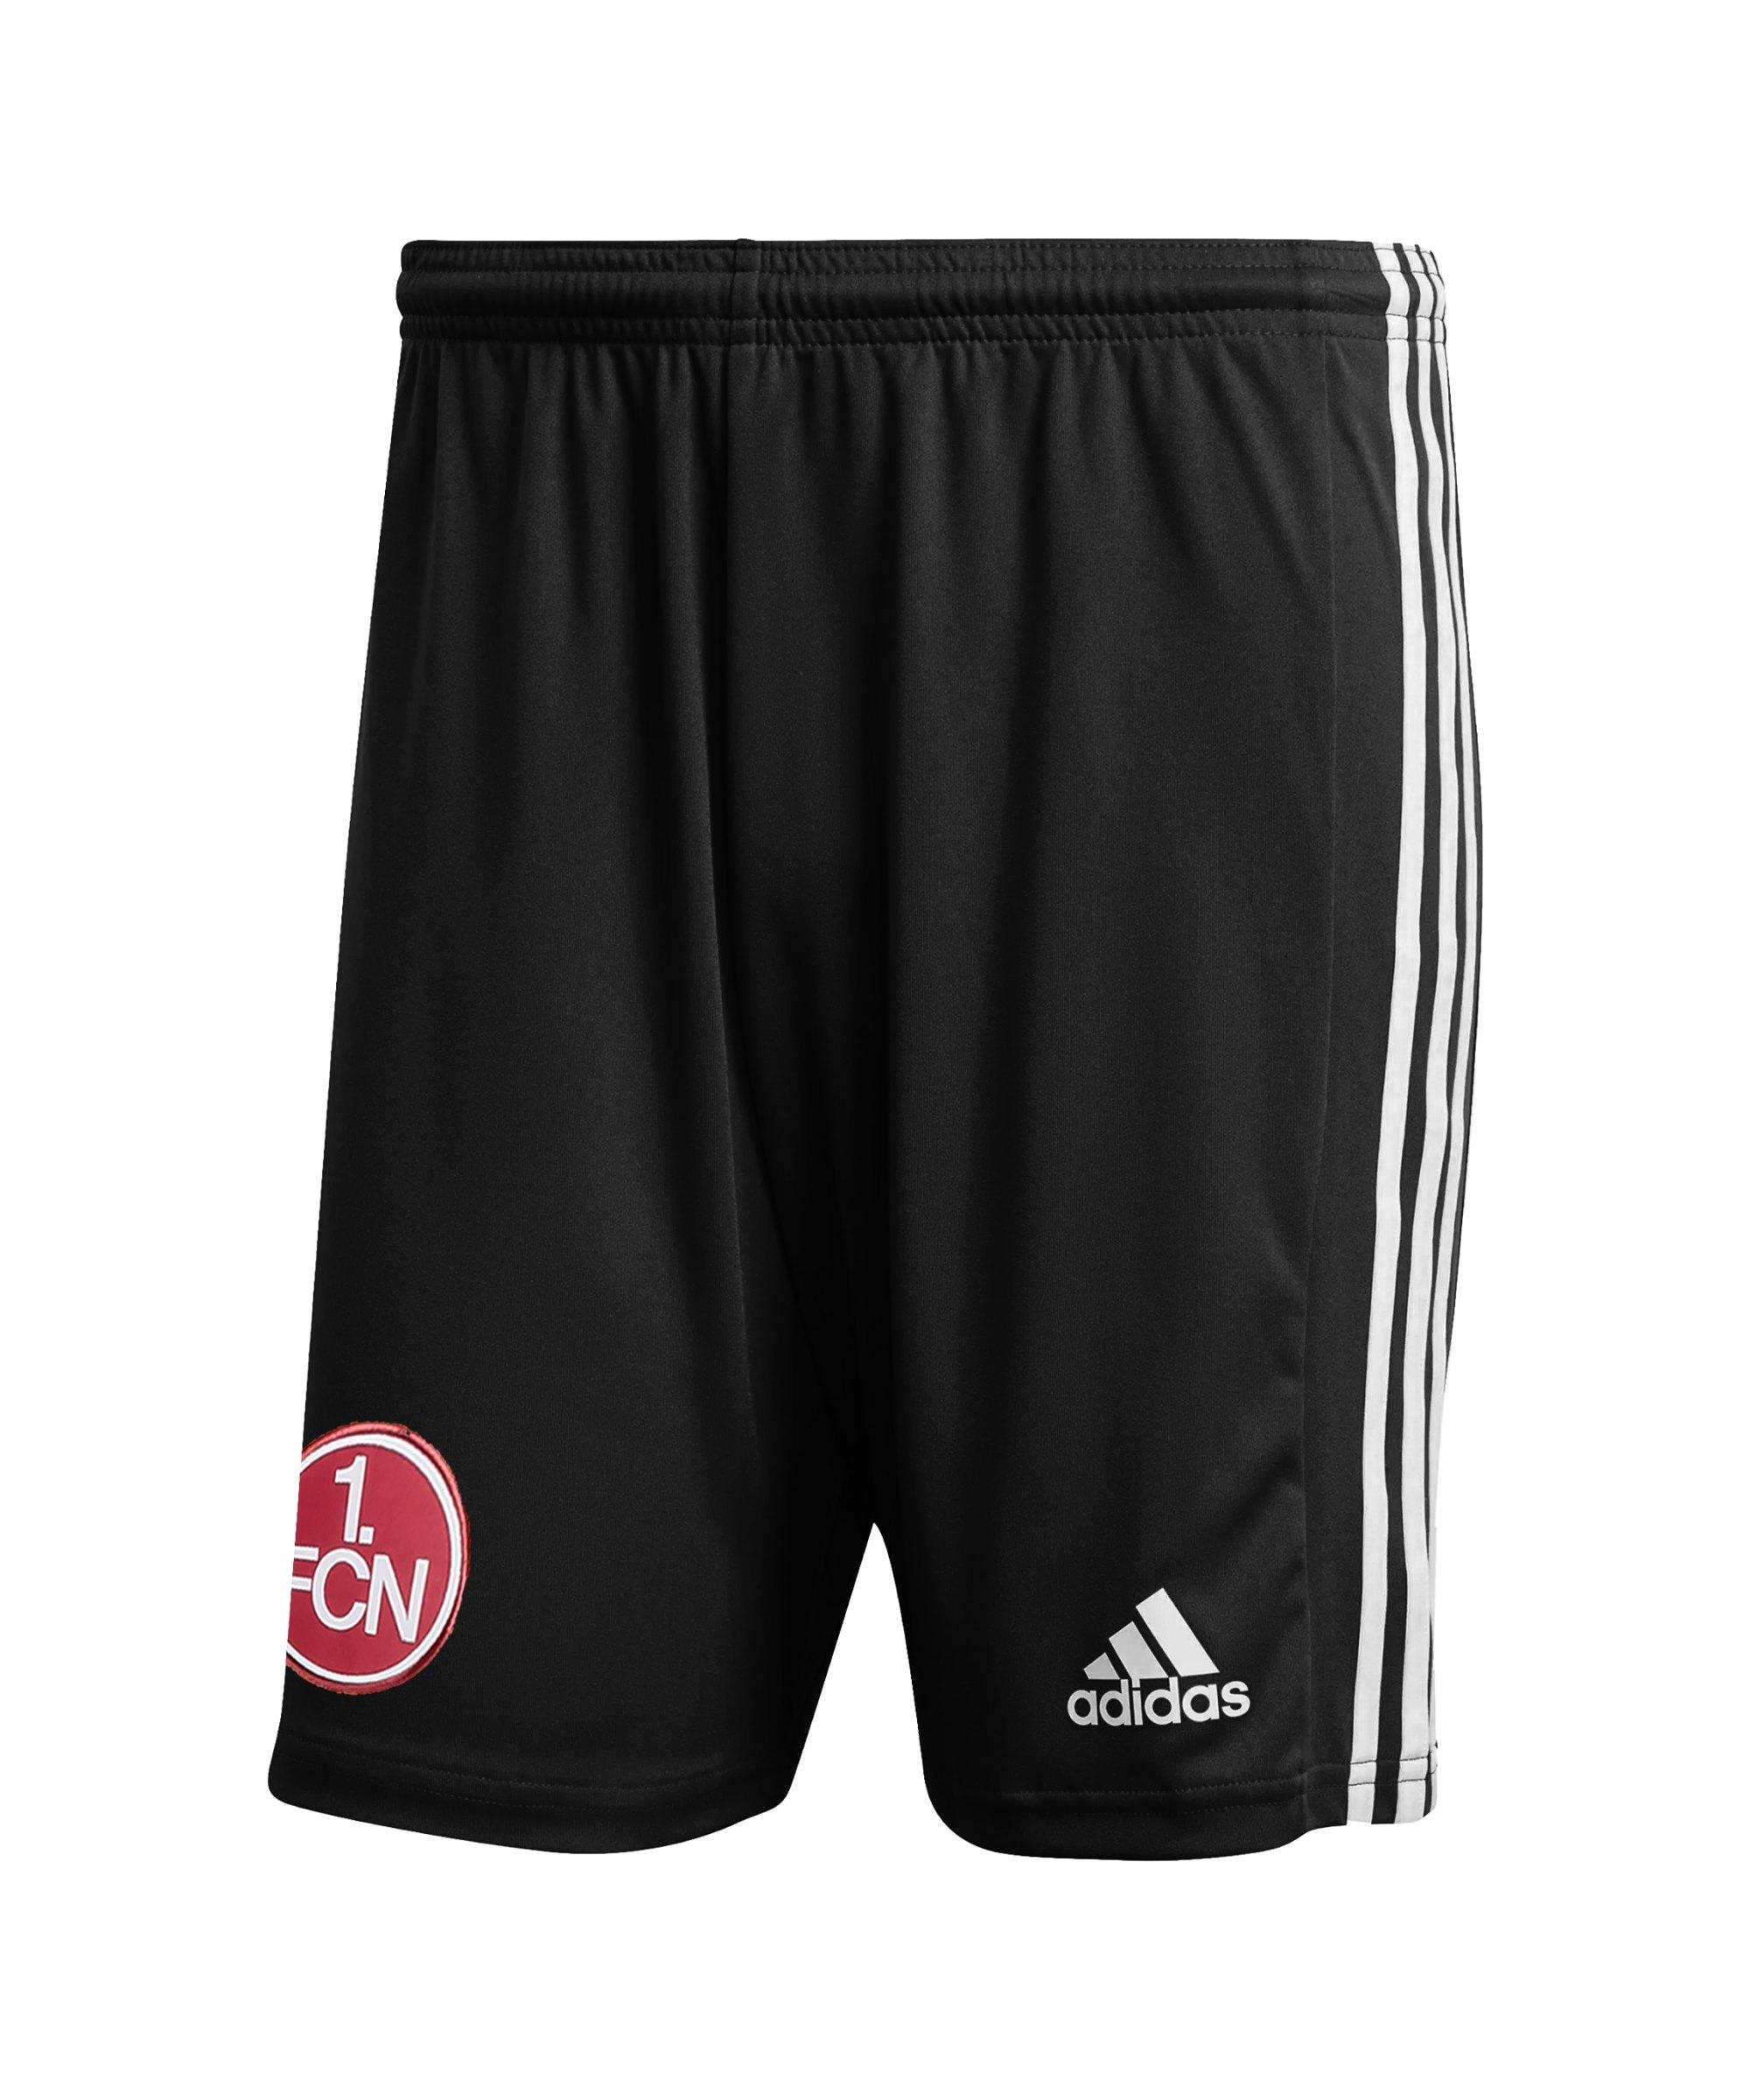 adidas 1. FC Nürnberg Short 3rd 2021/2022 Schwarz - schwarz